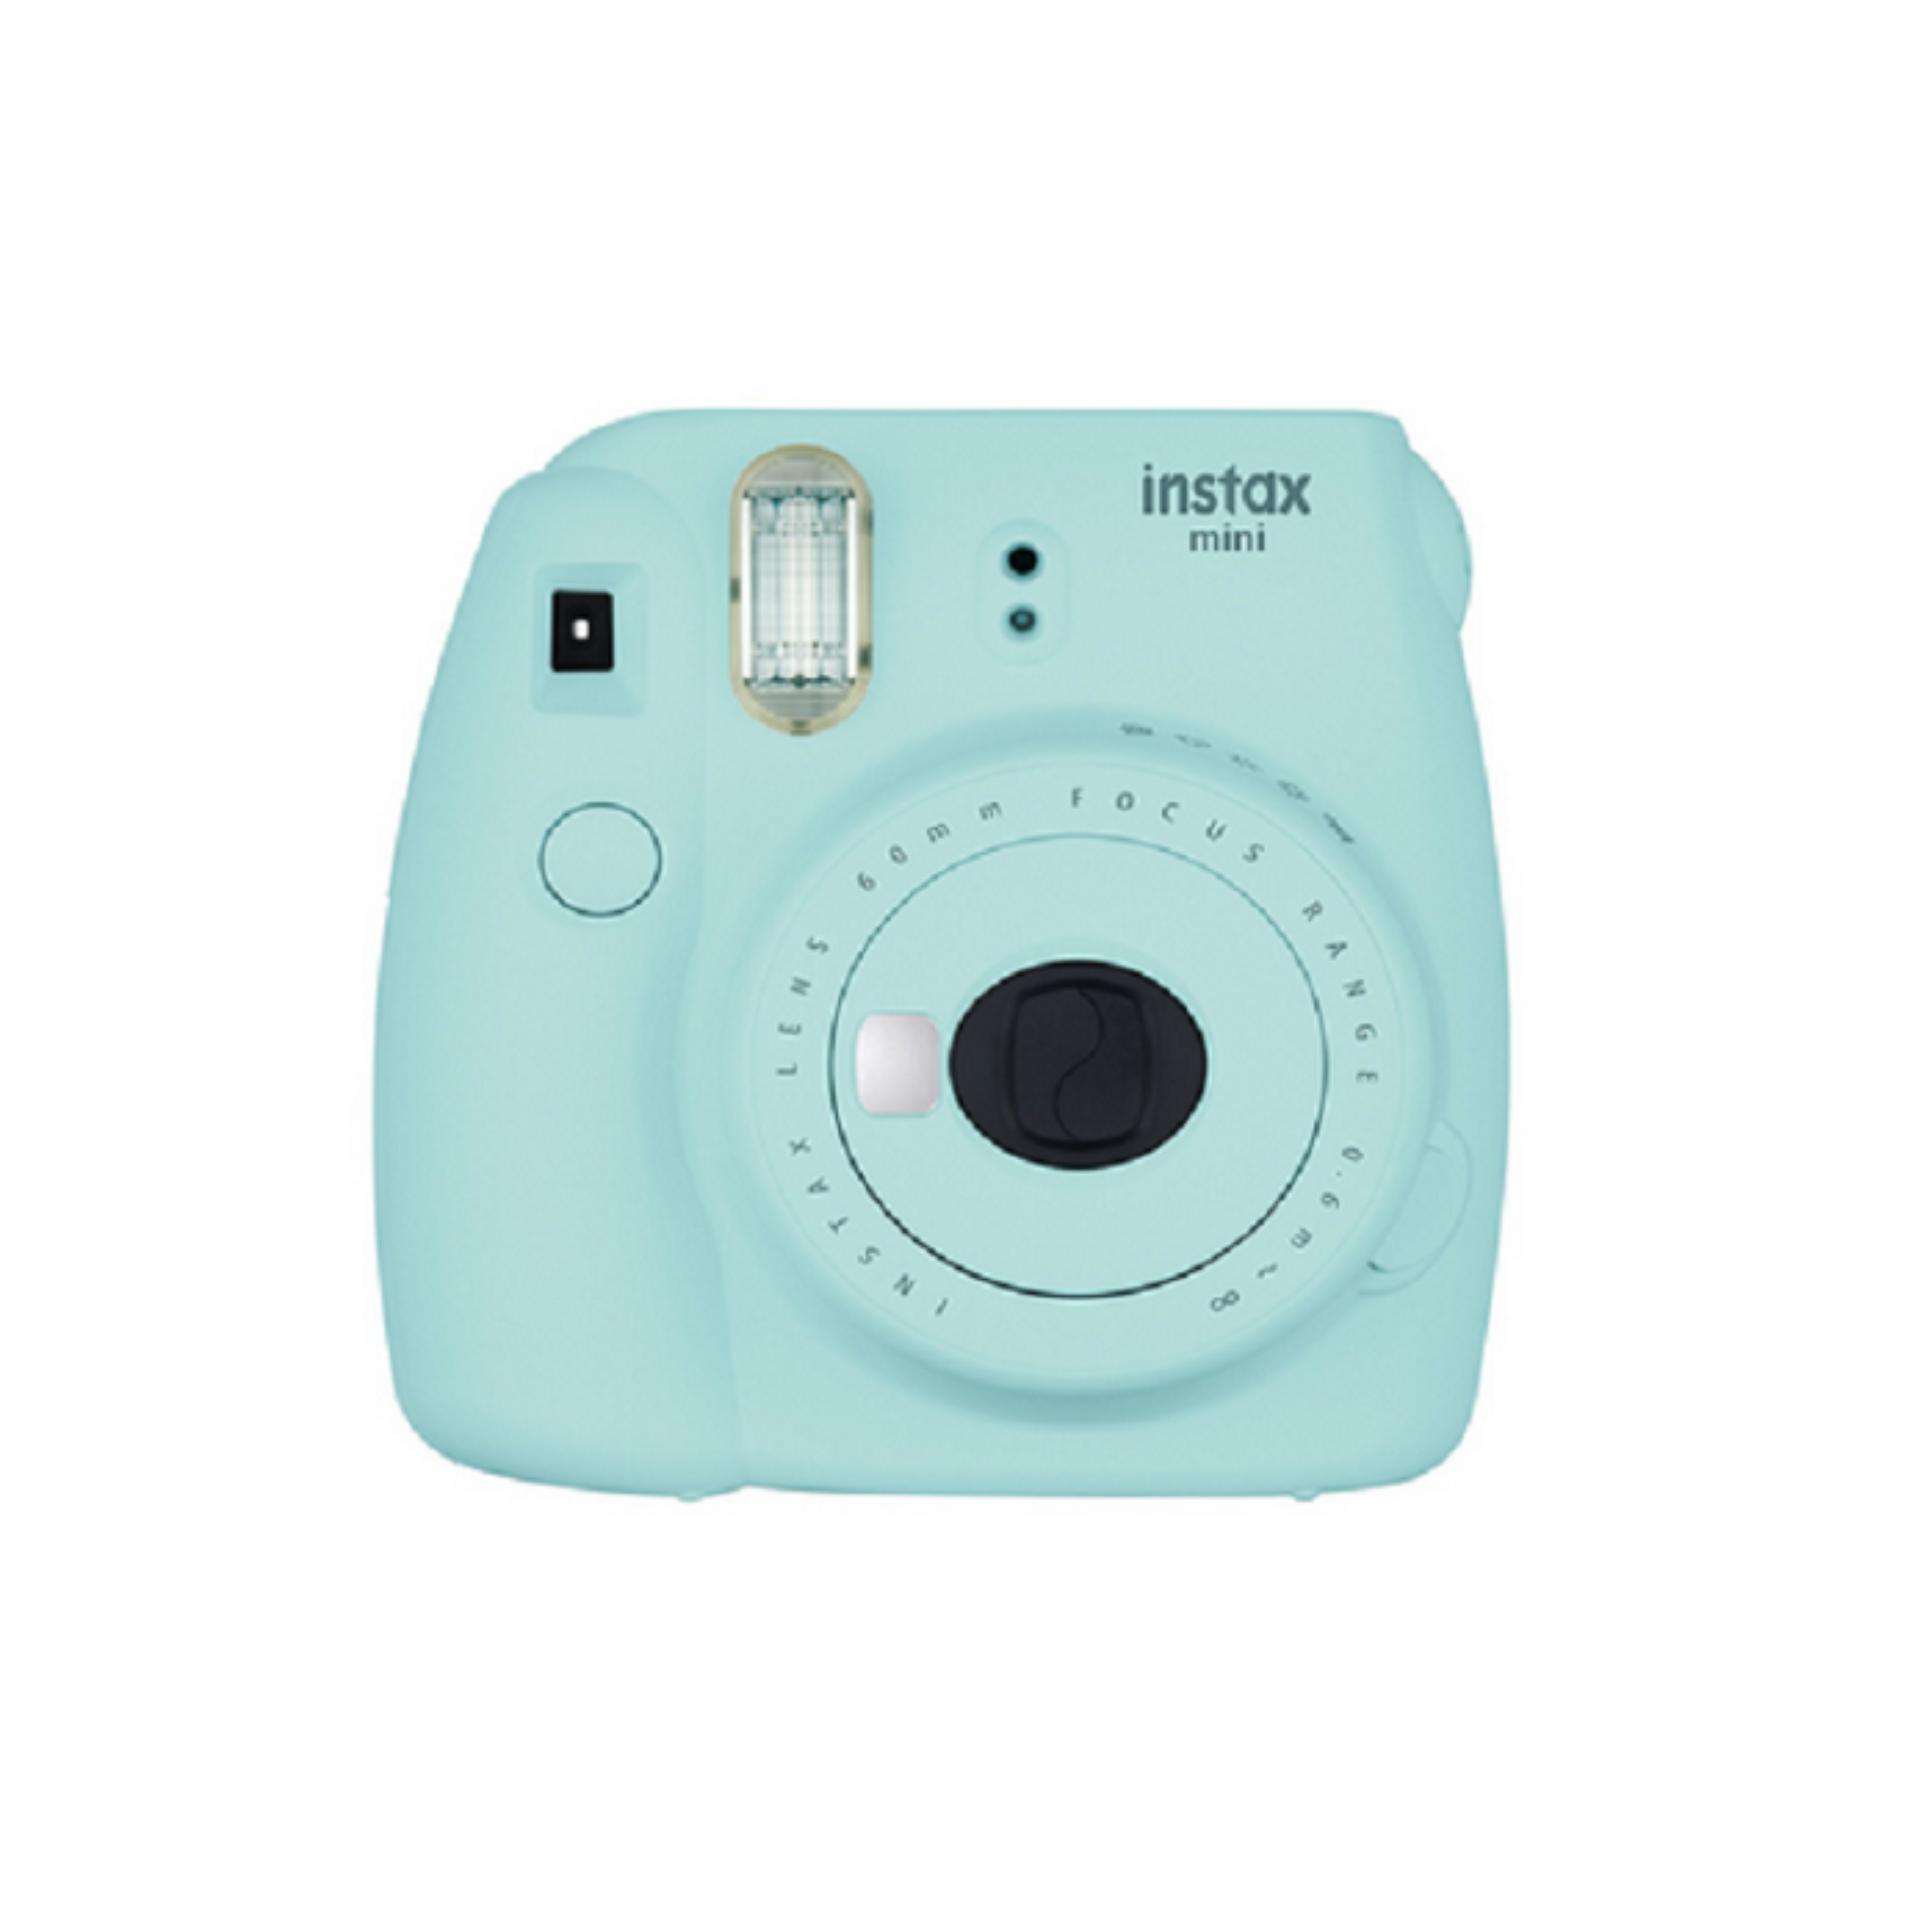 Fujifilm Instax Mini 9 Instant Camera Ice Blue + Free Bundle Gifts